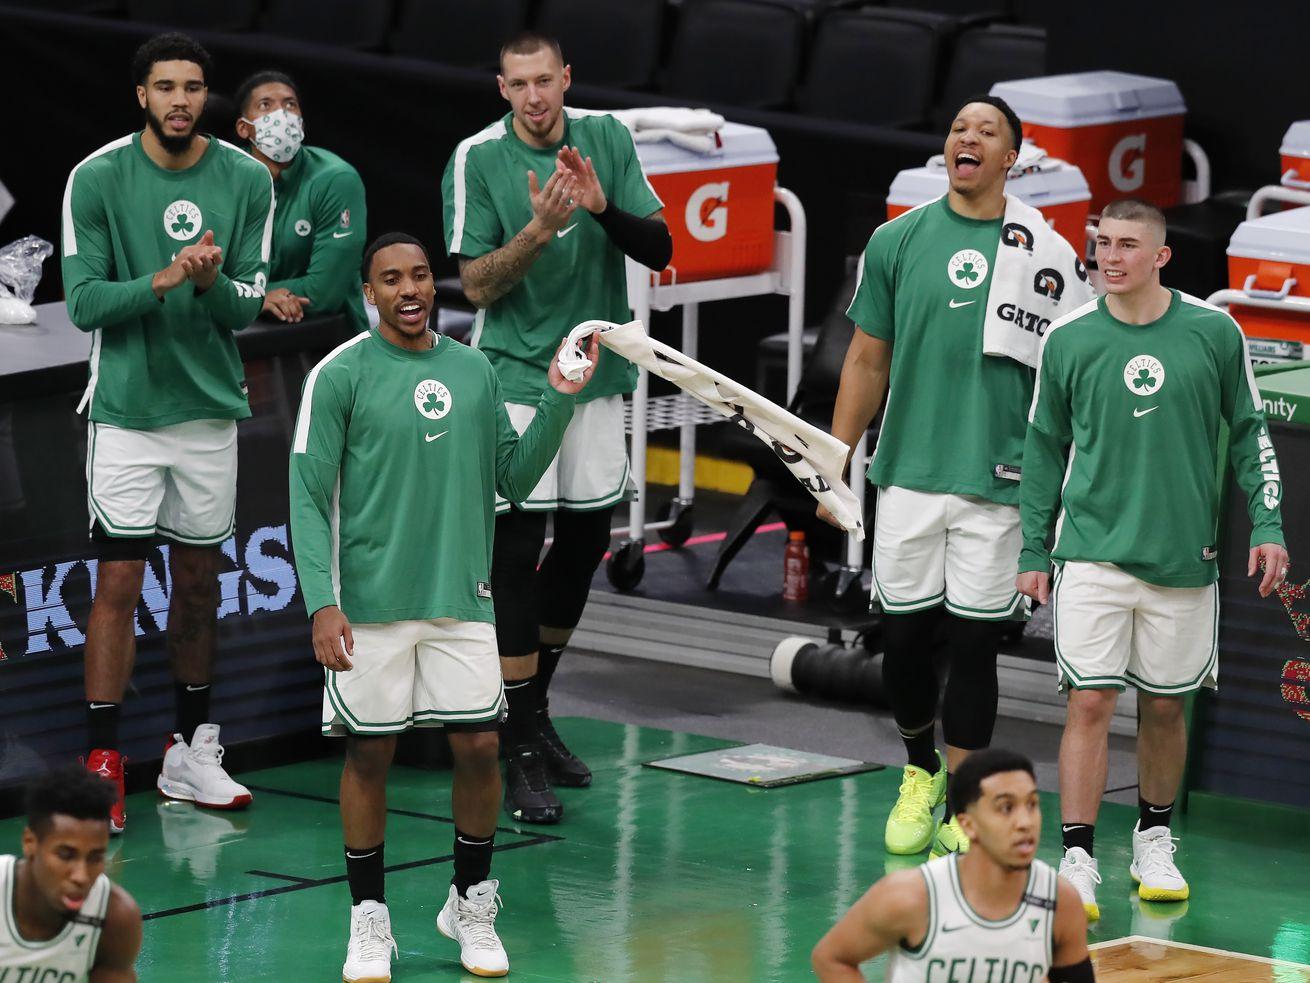 Three Boston Celtics games have been postponed this season because of coronavirus issues.